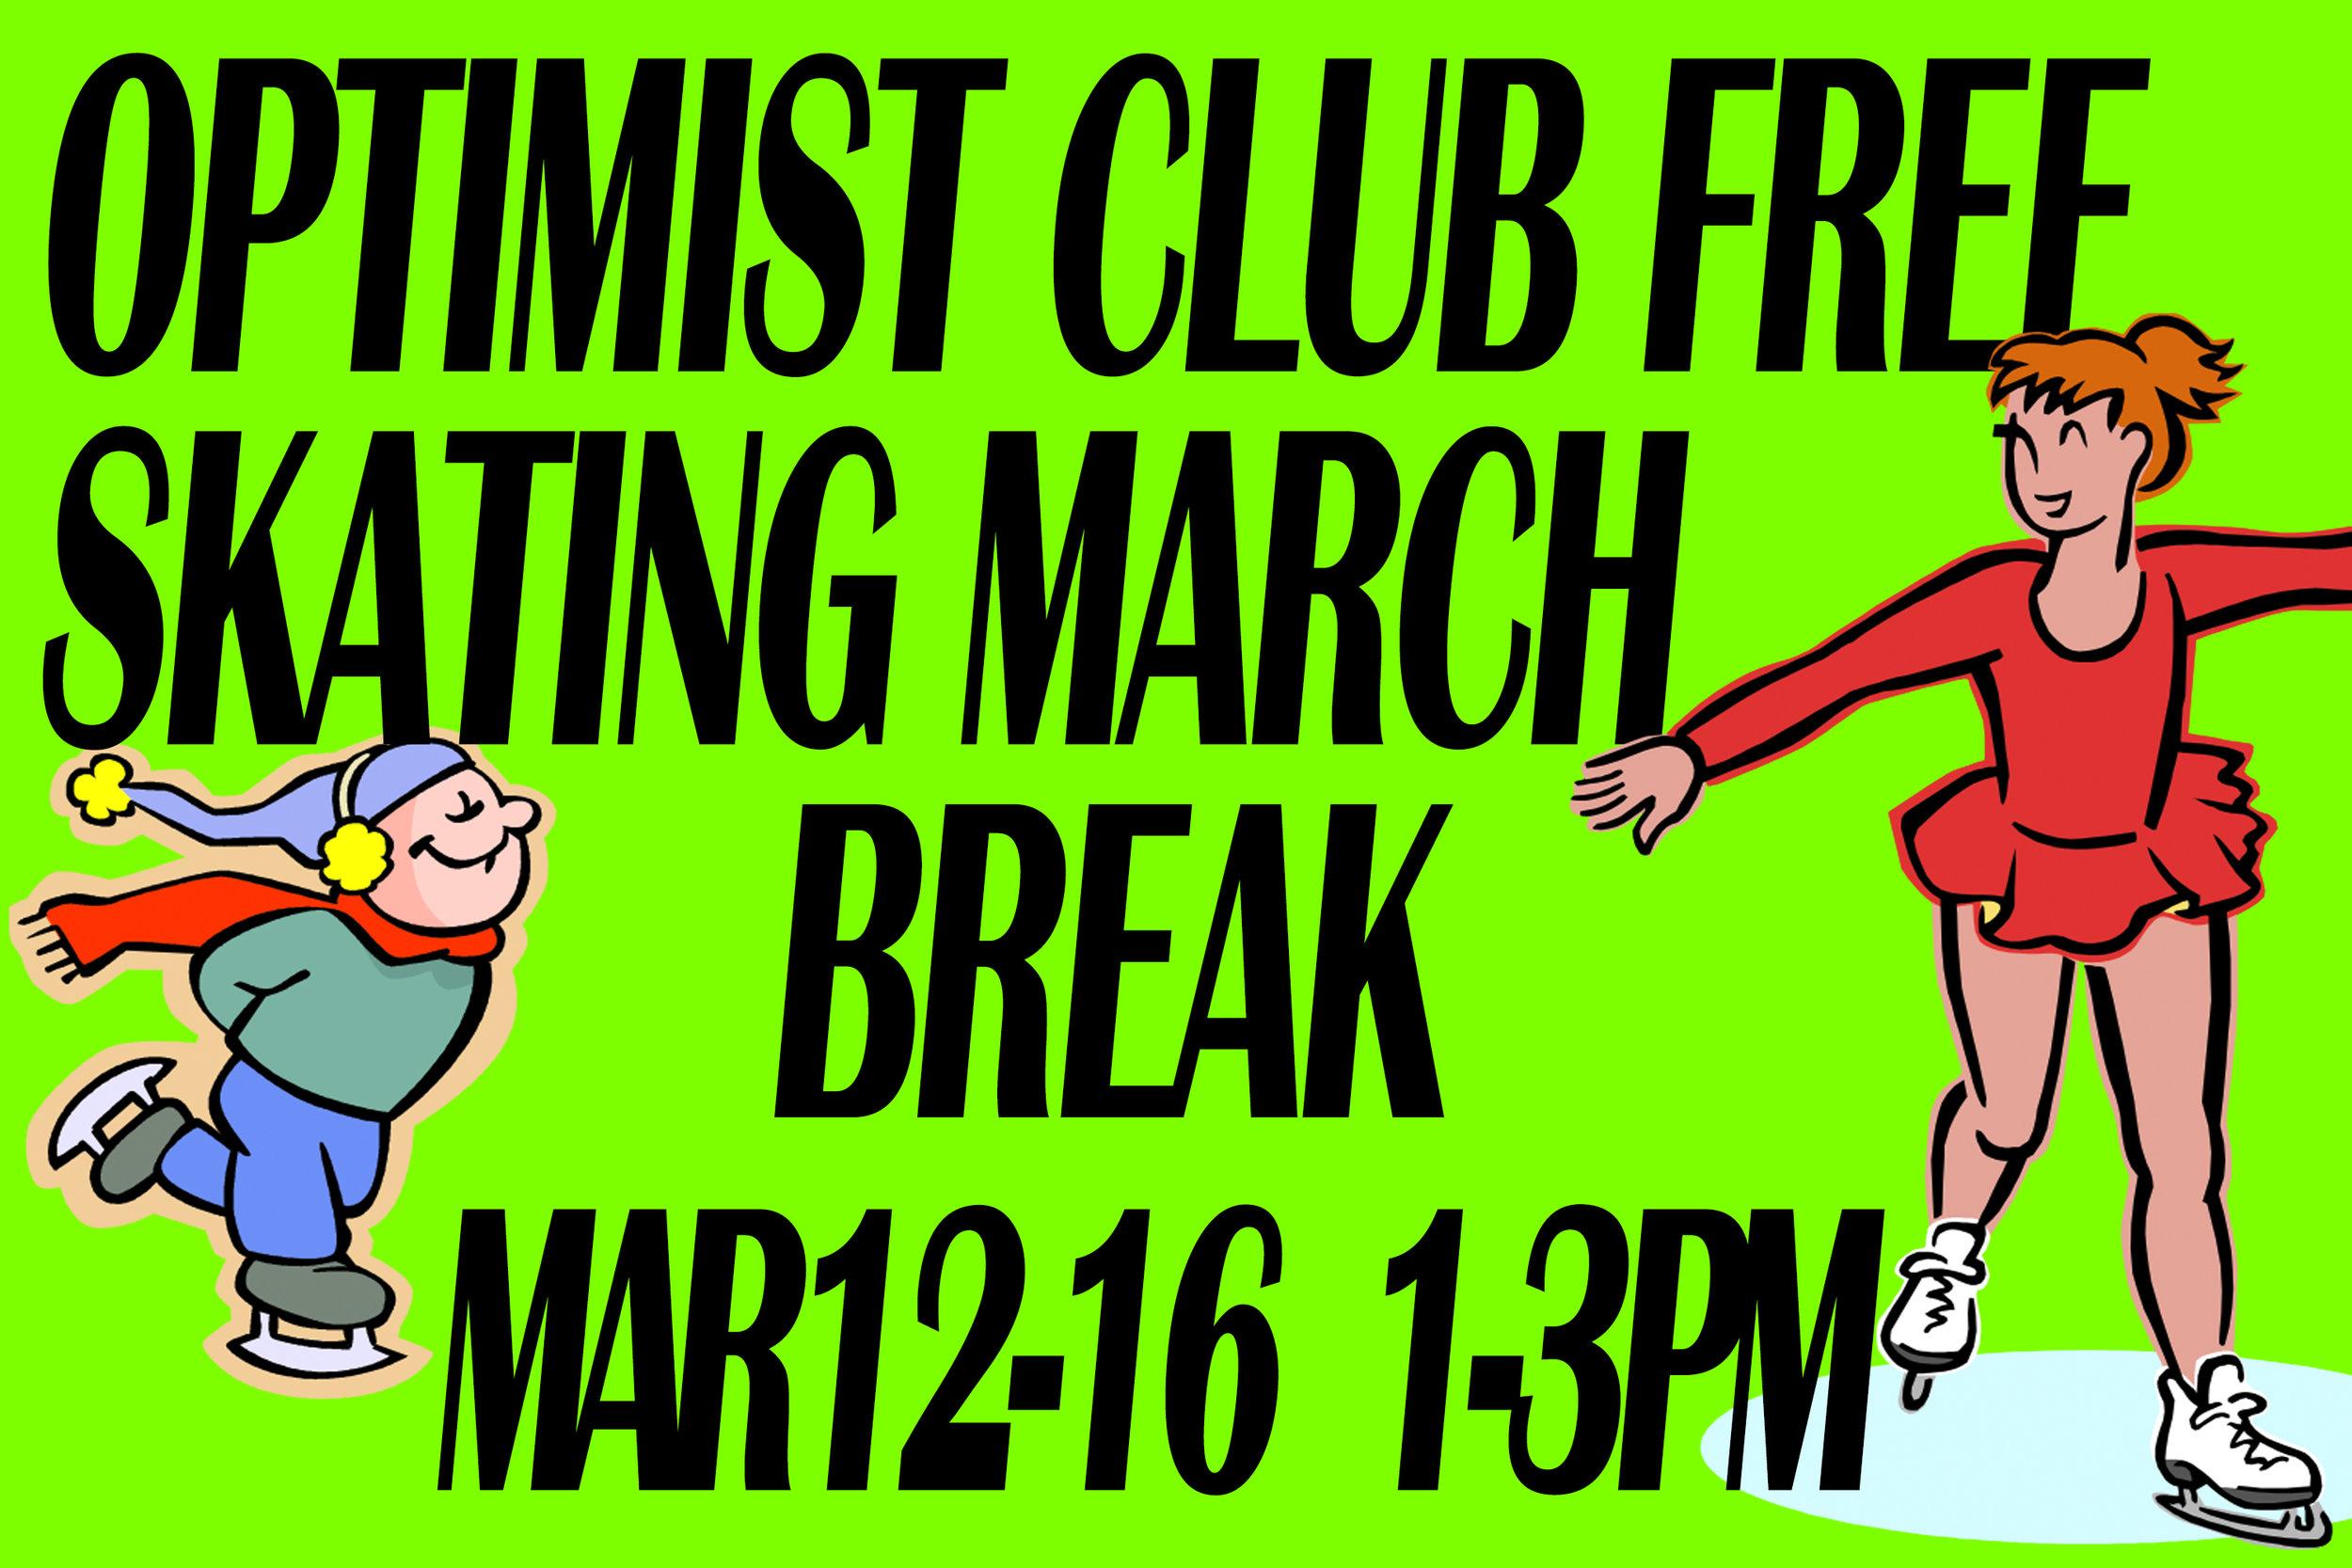 Free Skating - March Break 2018.jpg